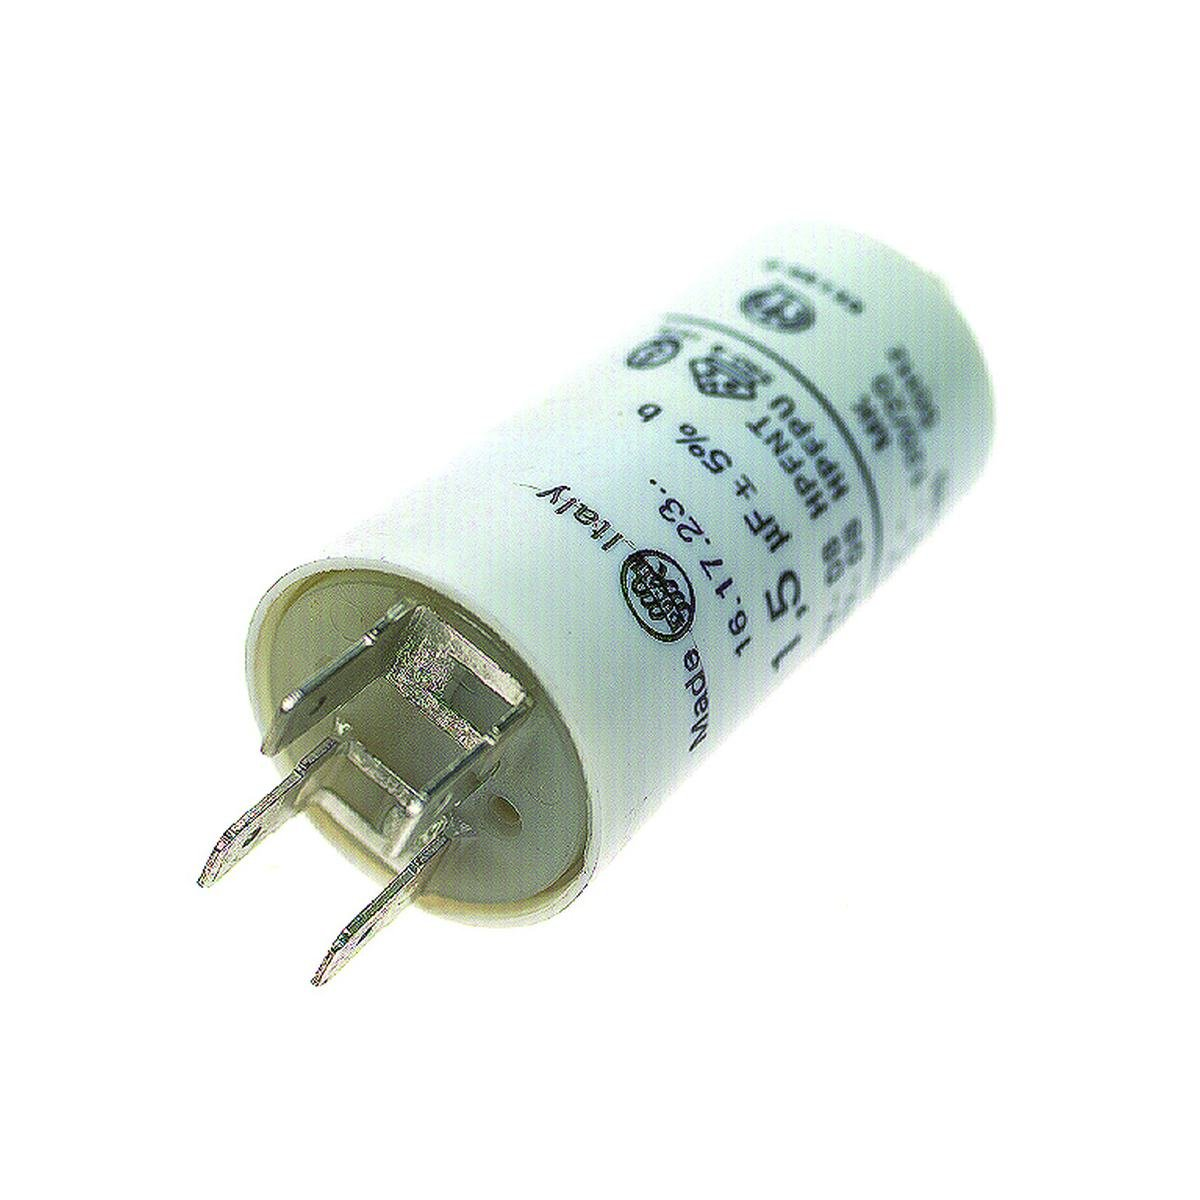 Kondensator 1,5 µF 450V